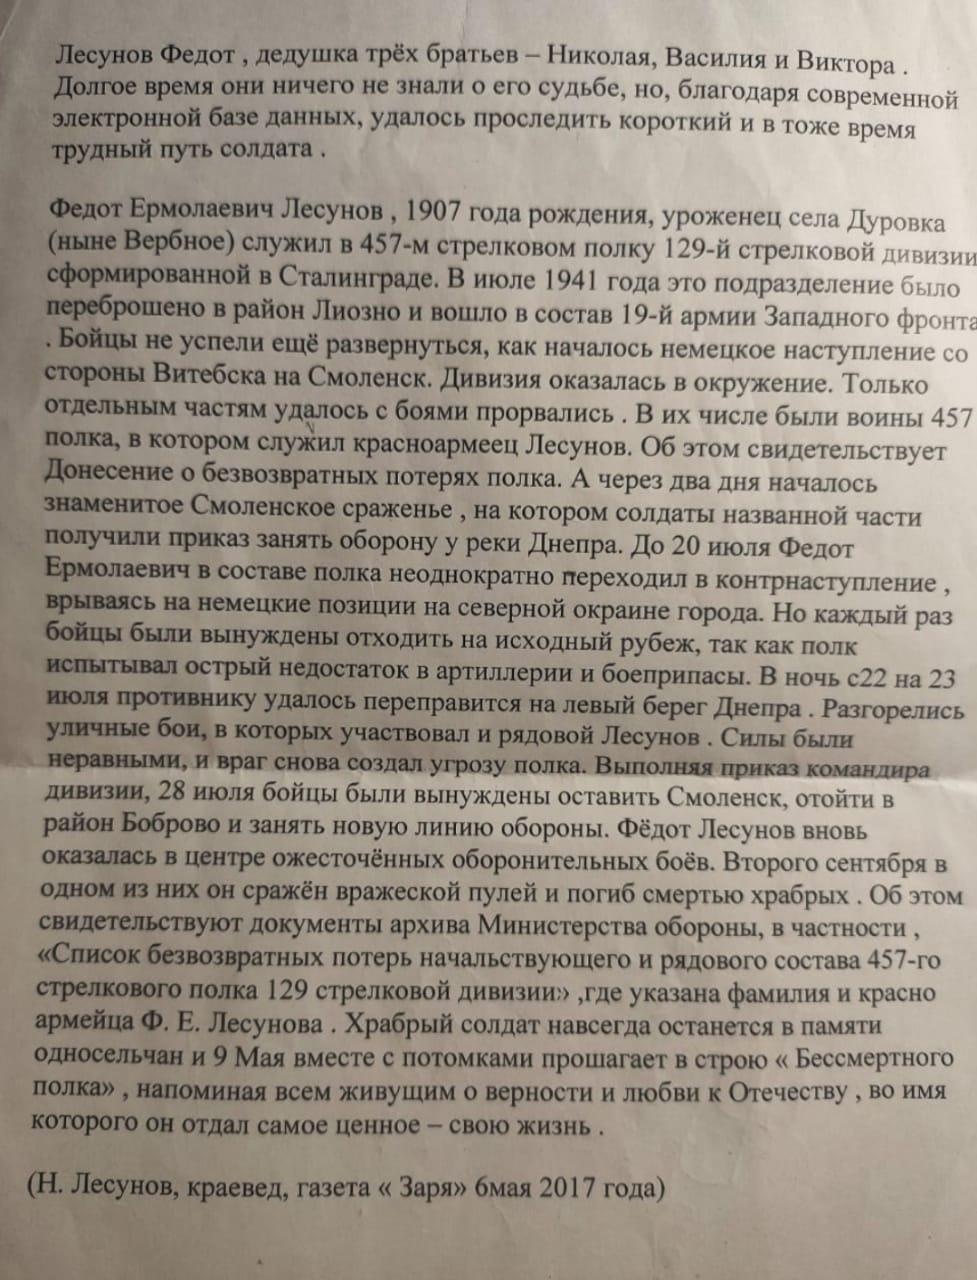 http://vrnschool85.ucoz.ru/111/IMG-20200506-WA0031.jpg